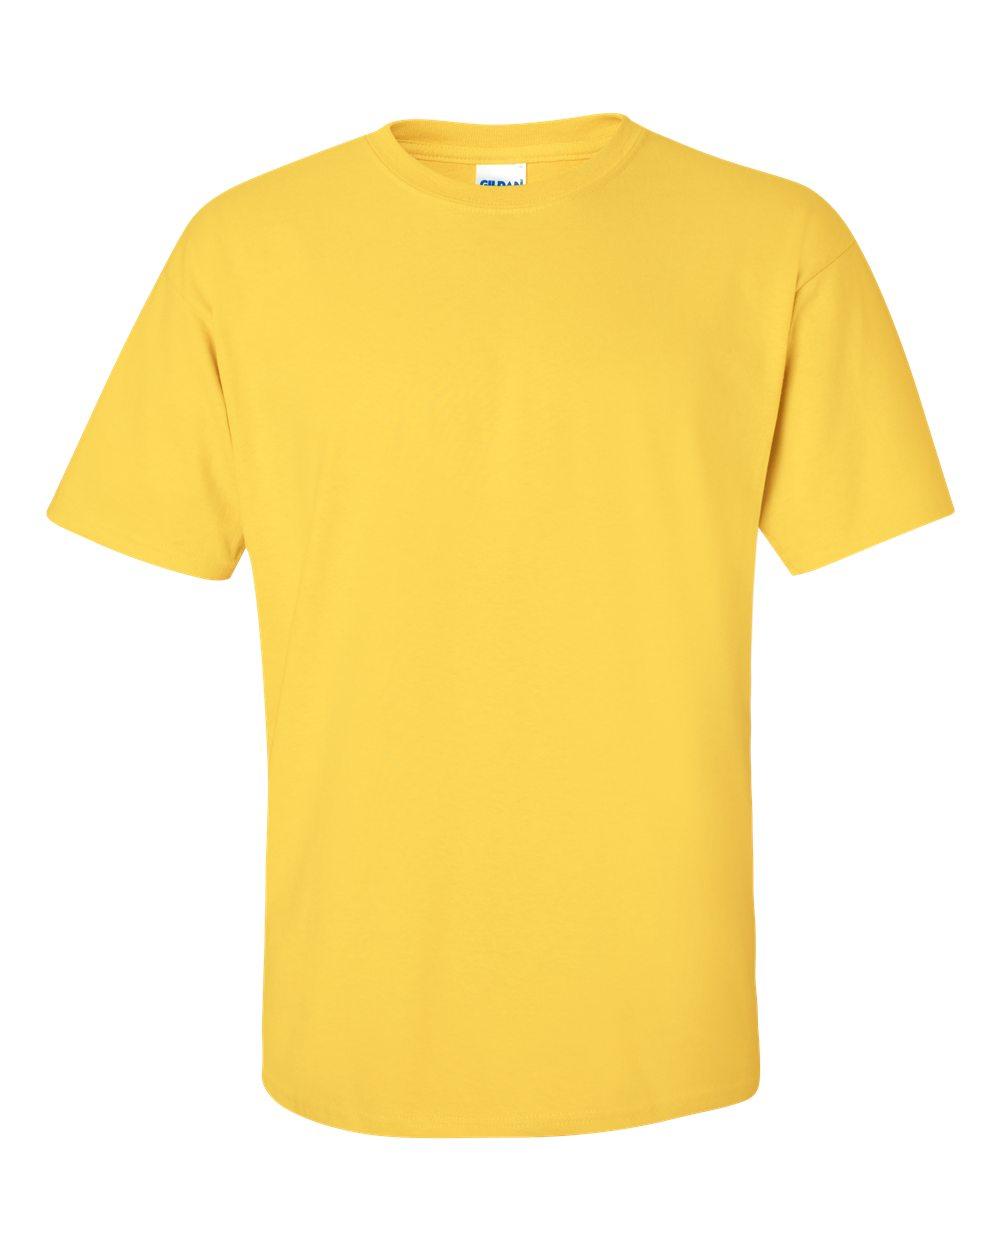 Top 10 shirts for custom screen printing kirkwood trading for Custom printed t shirt